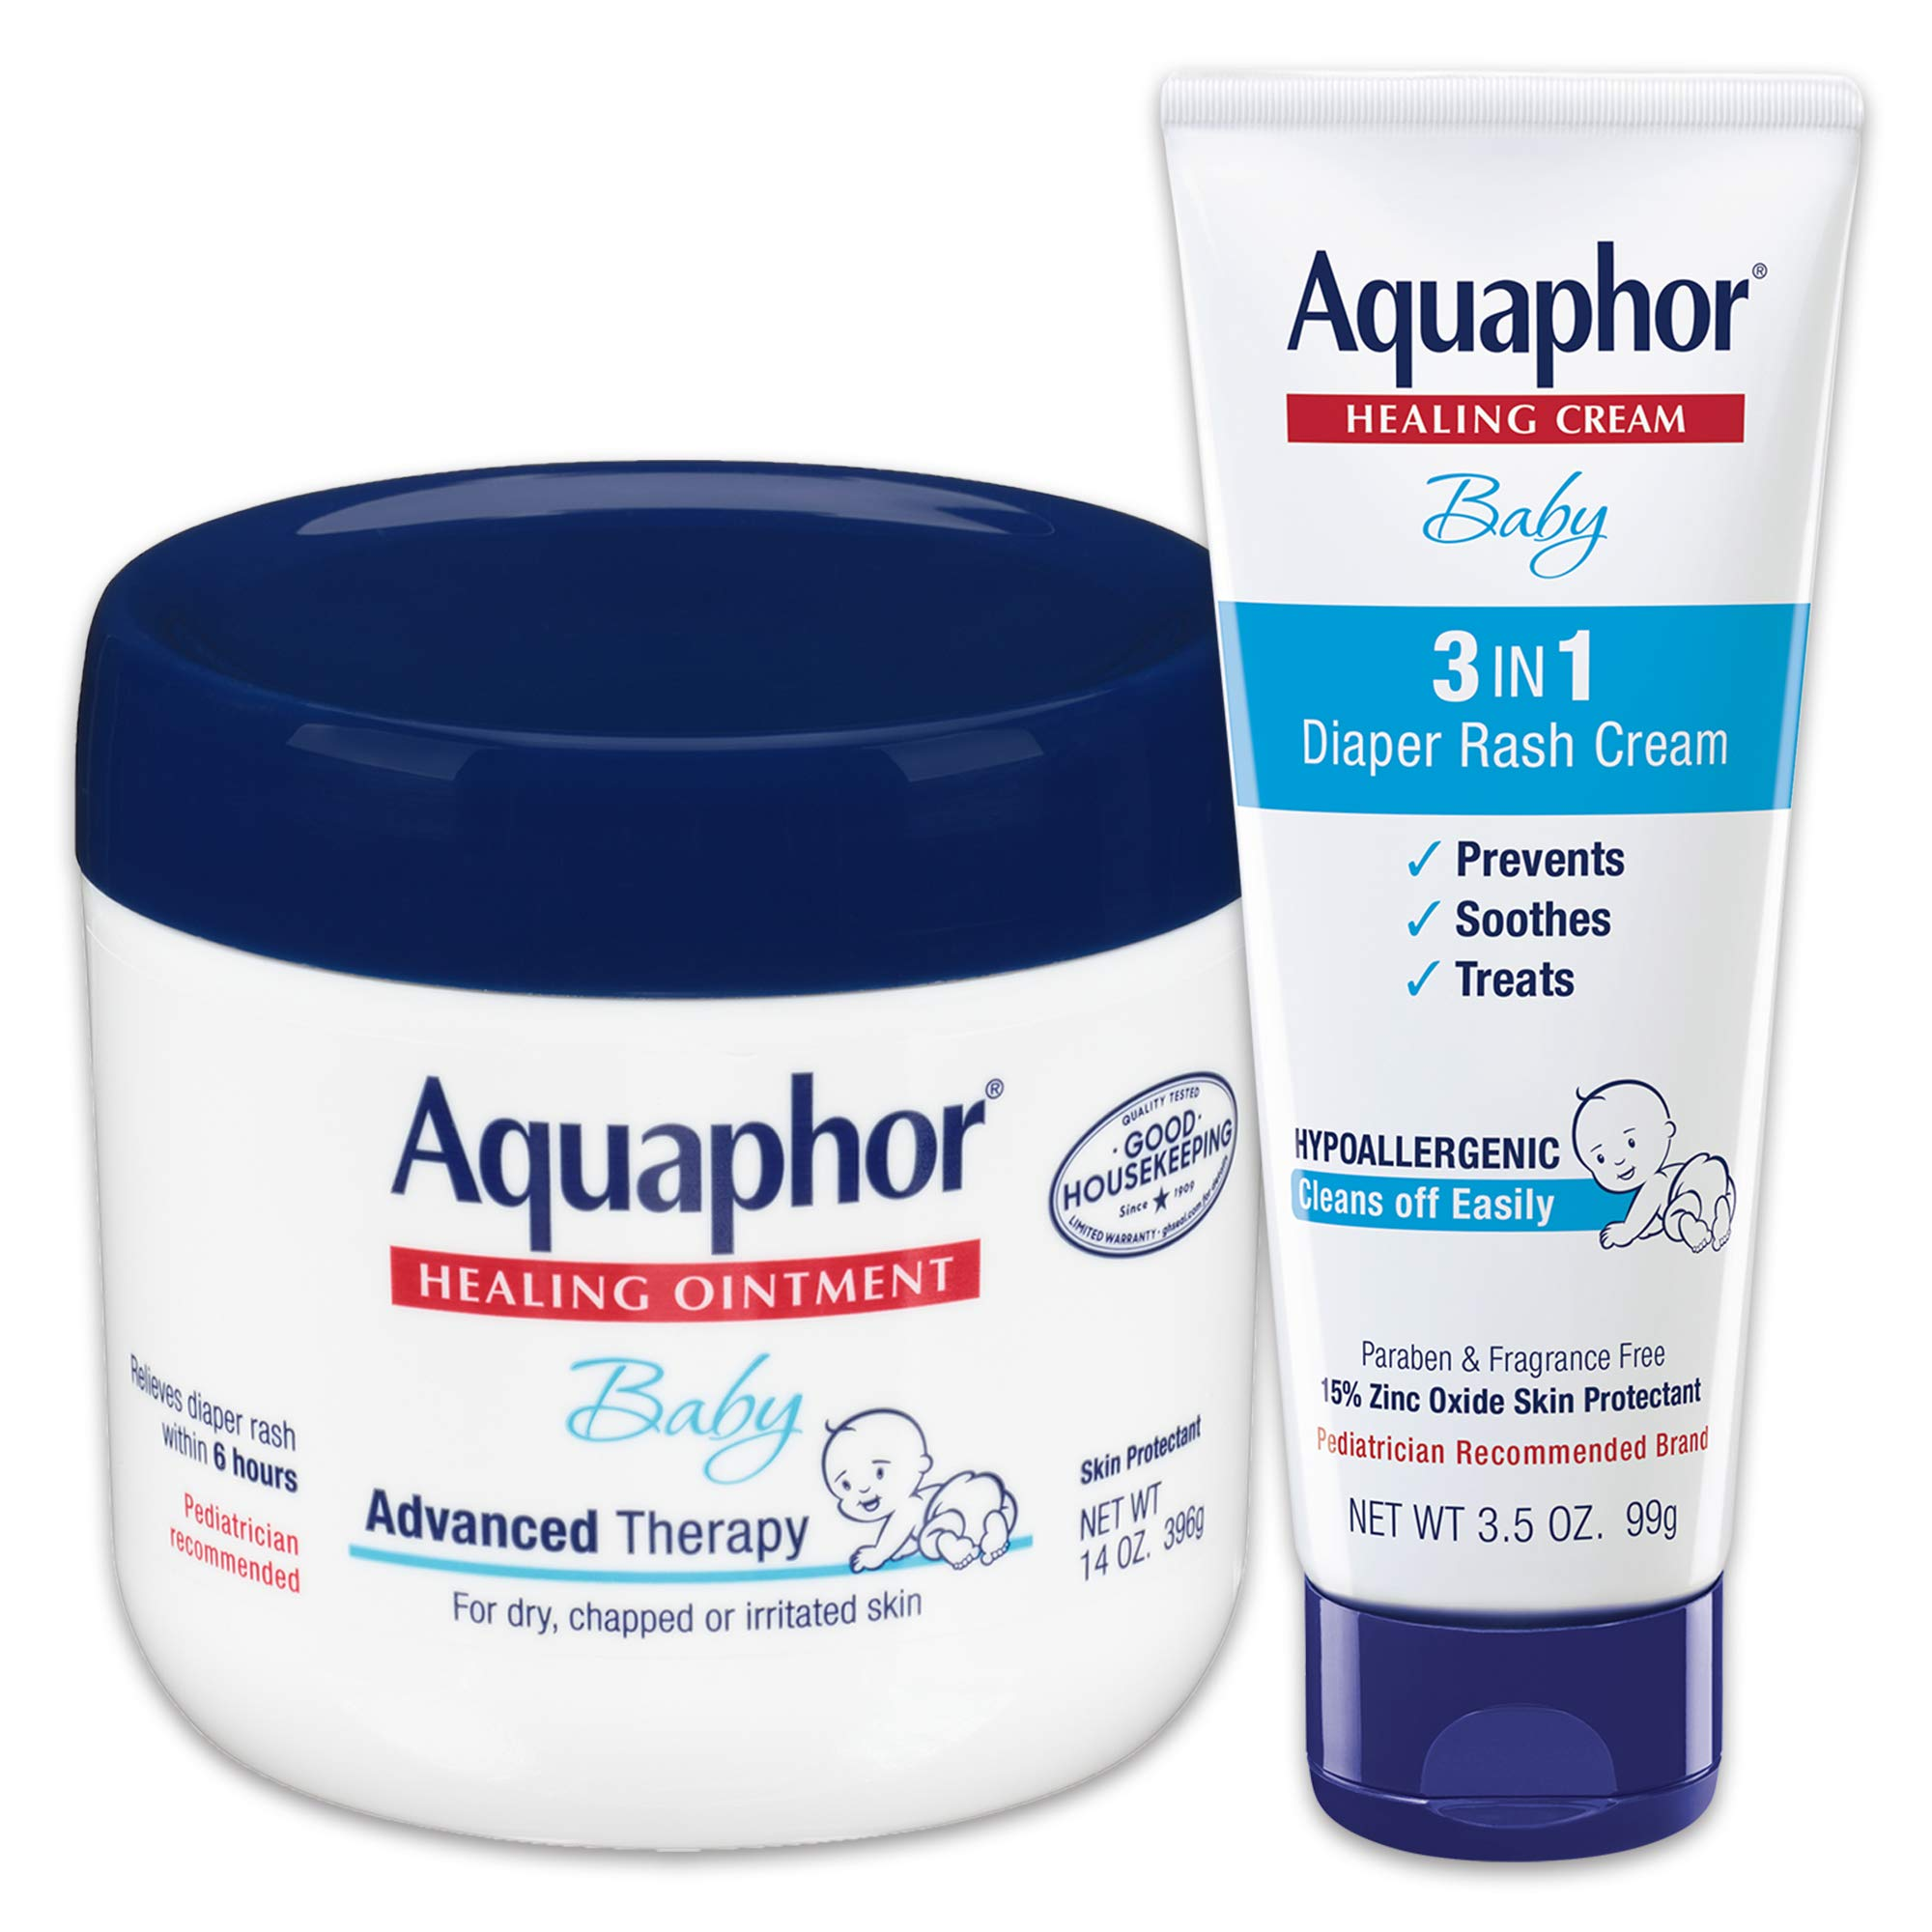 Aquaphor Baby Skin Care Set - Fragrance Free, Prevents, Soothes and Treats Diaper Rash - Includes 14 oz. Jar of Advanced Healing Ointment & 3.5 oz Tube of Diaper Rash Cream by Aquaphor